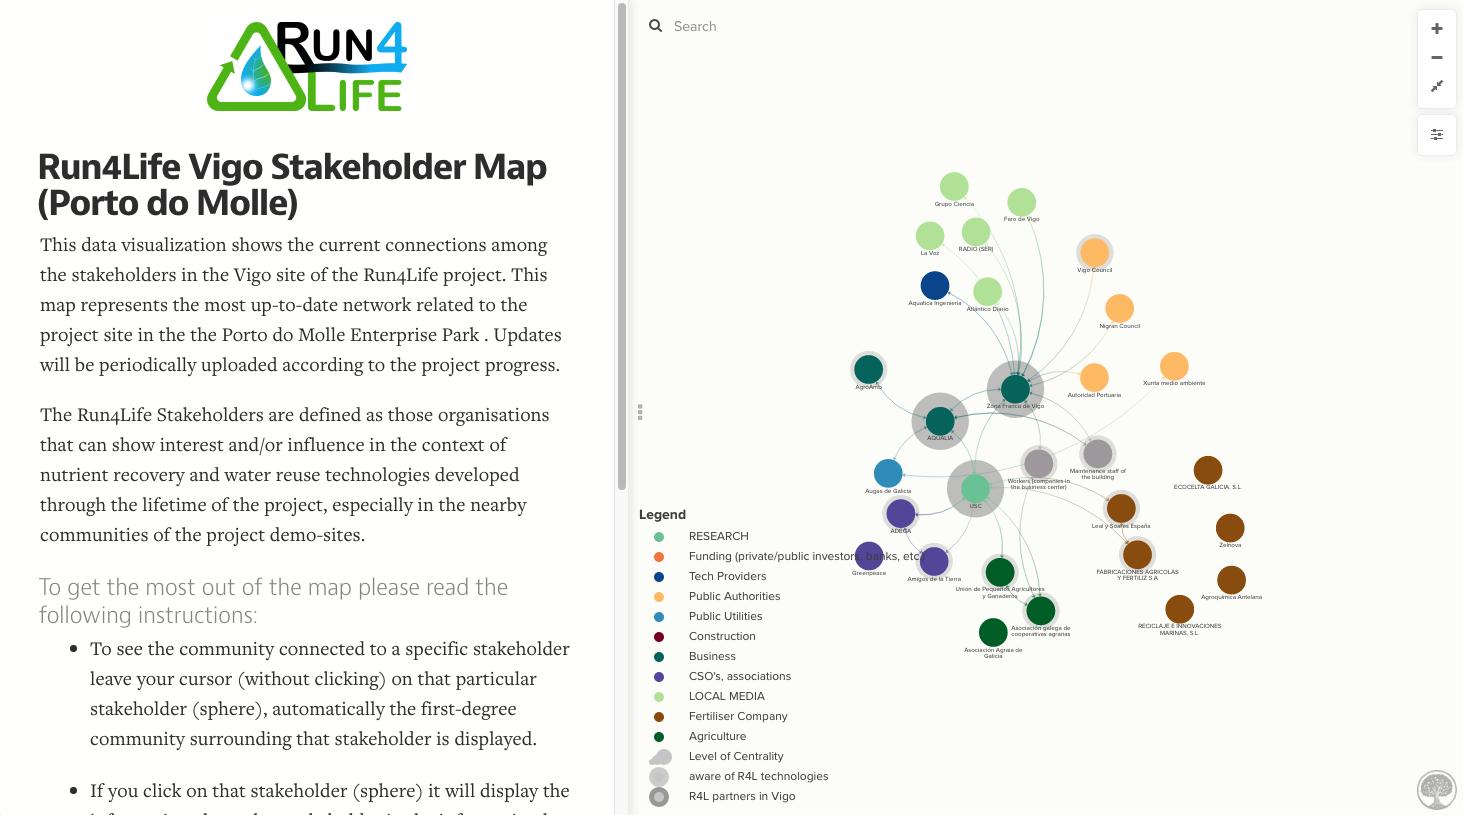 RUN4Life Social Network Analysis Example